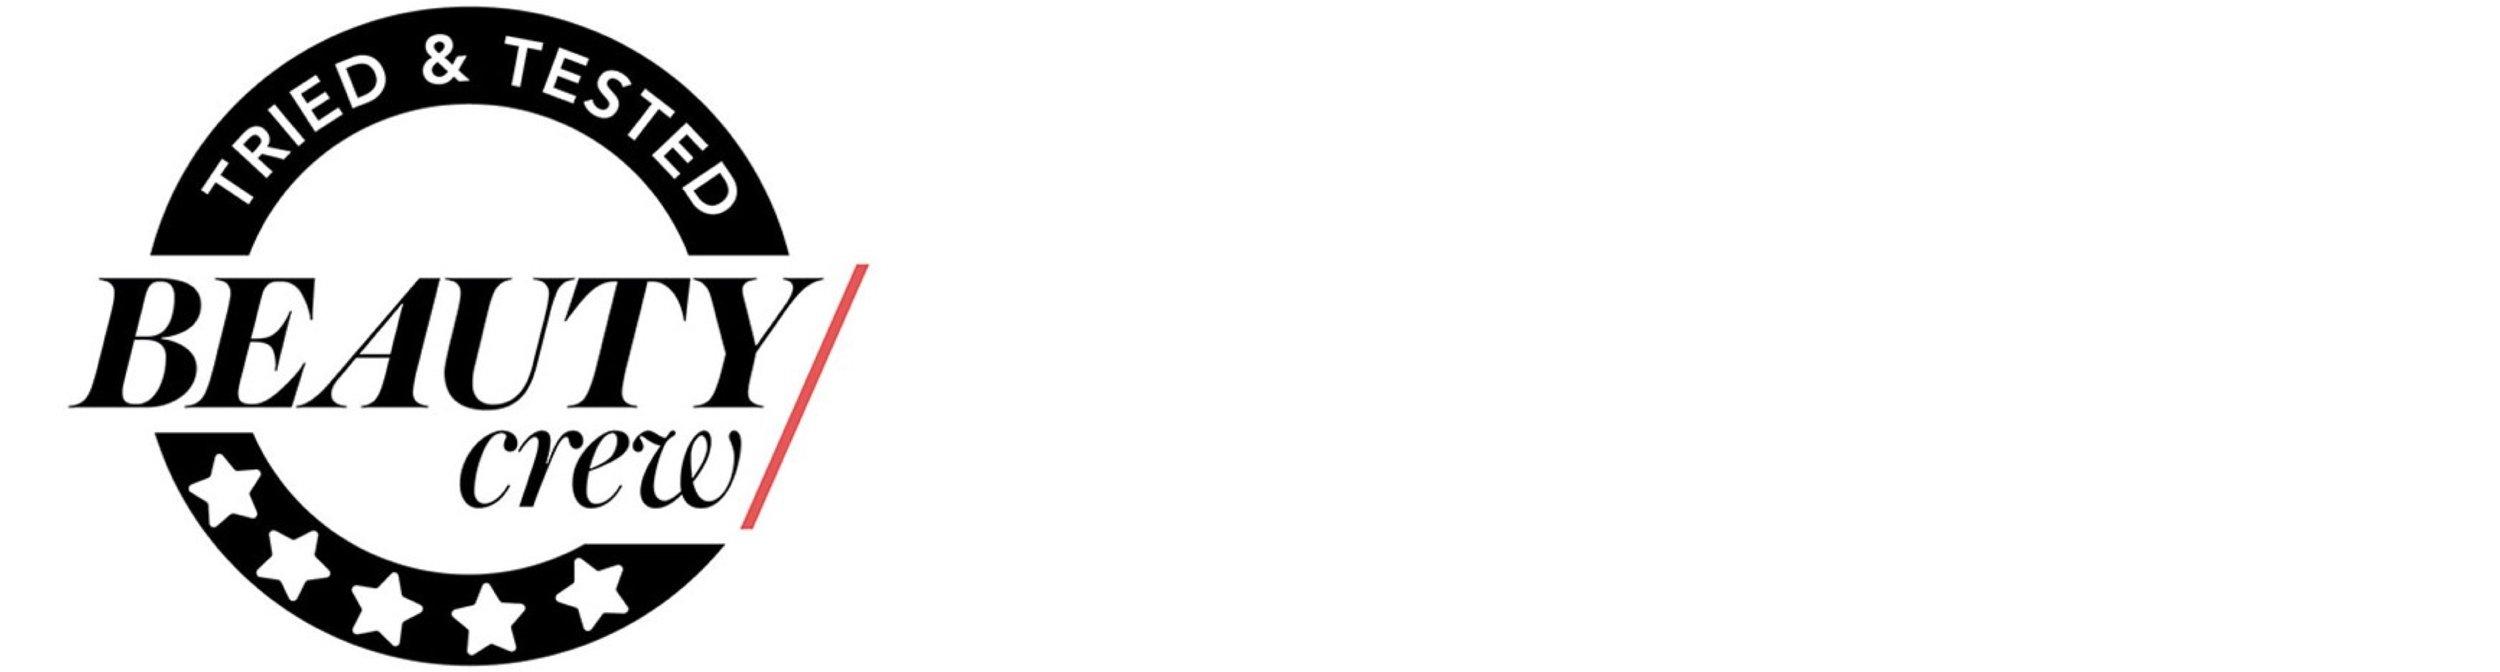 BeautyCrew 5 stars rating.jpg